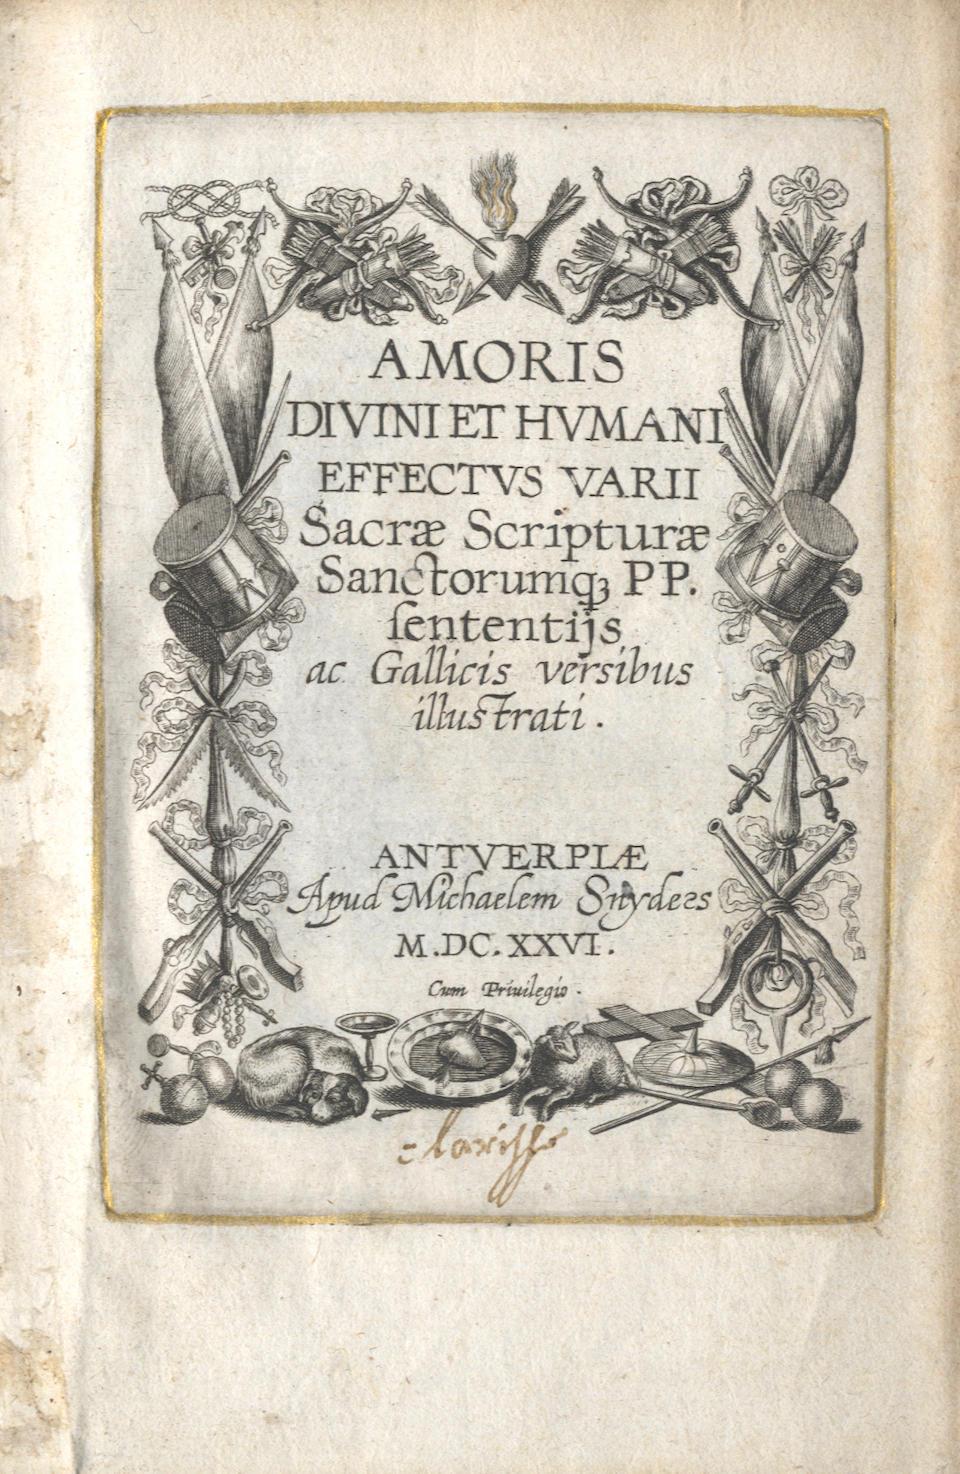 EMBLEM BOOK Amoris divini et humani effectus varie, FIRST EDITION, Antwerp, Michael Snyders, 1626